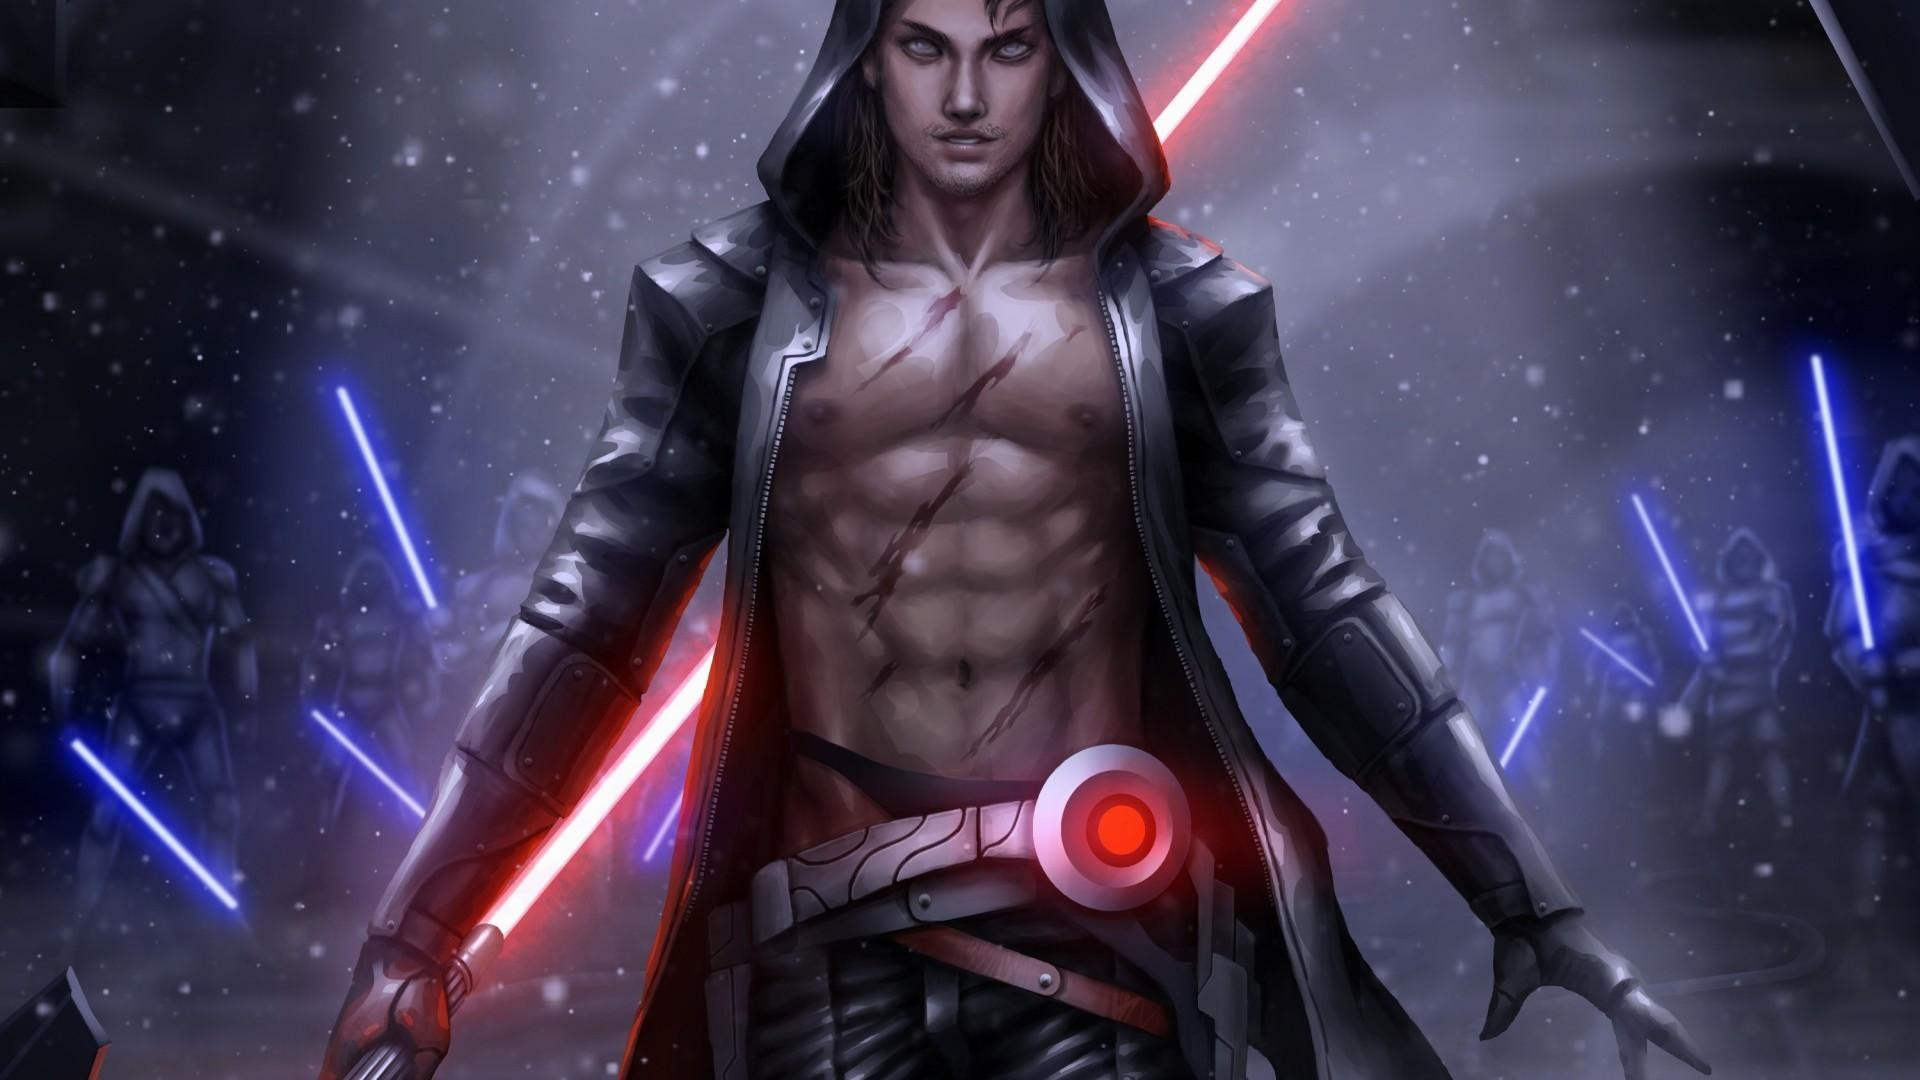 Download-star-wars-sith-lightsaber-fan-art-fantasy-